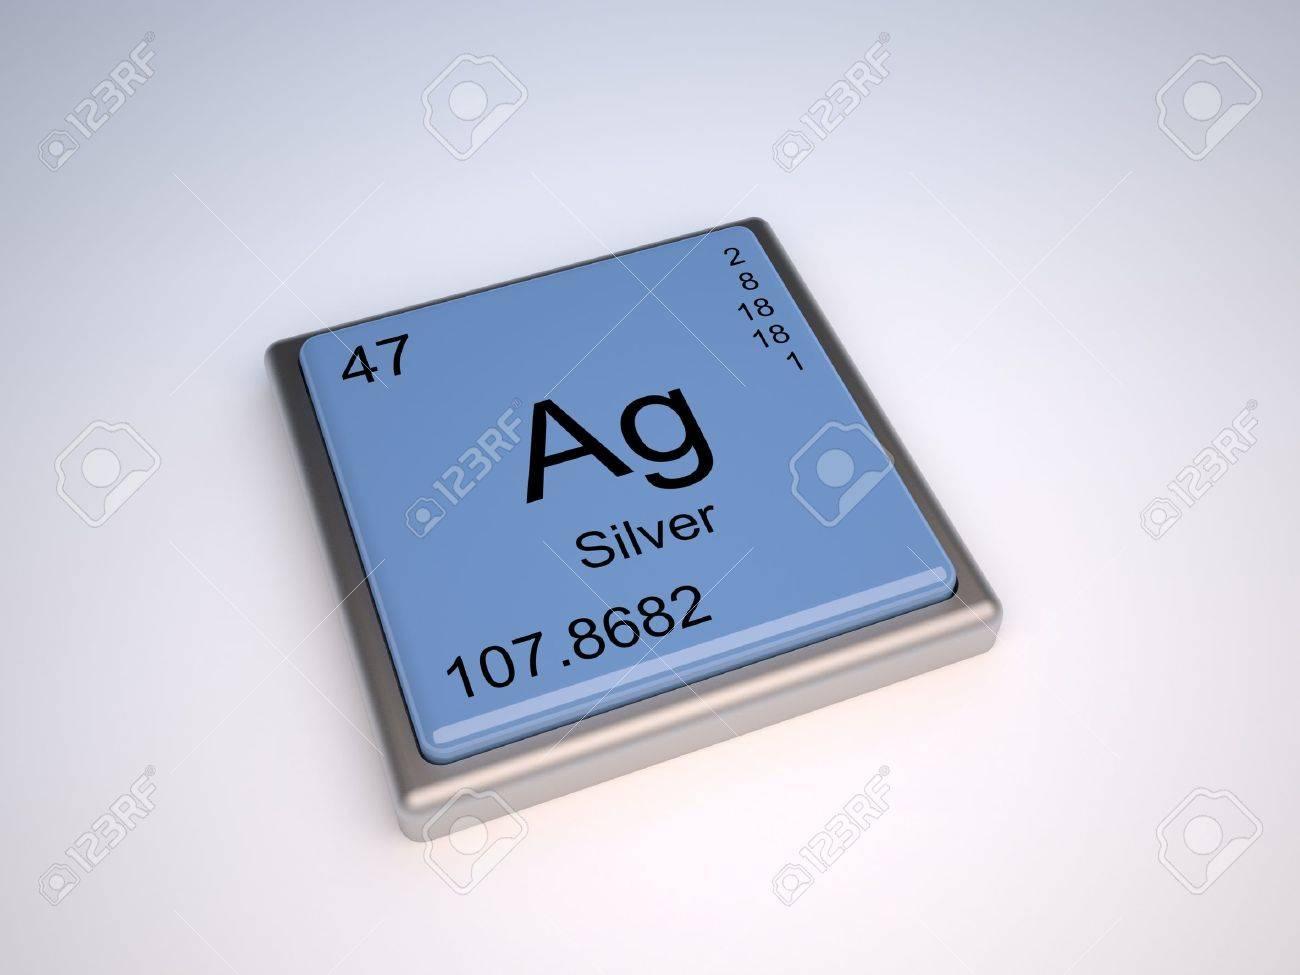 Plata elemento qumico de la tabla peridica con smbolo ag fotos foto de archivo plata elemento qumico de la tabla peridica con smbolo ag urtaz Choice Image